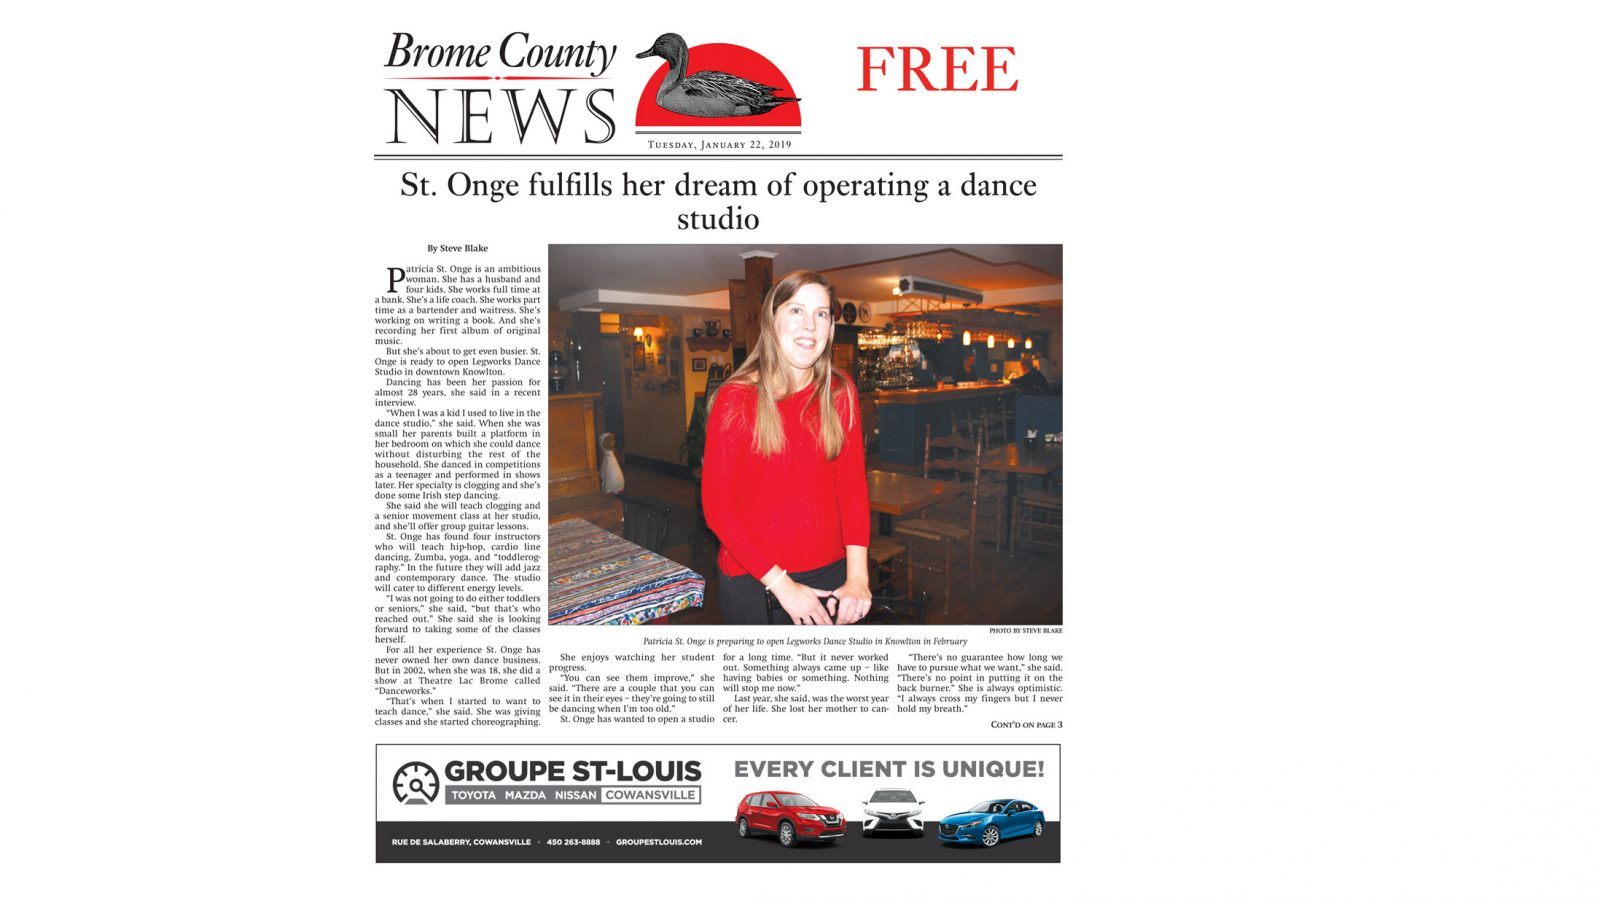 Brome County News – January 22, 2019 edition